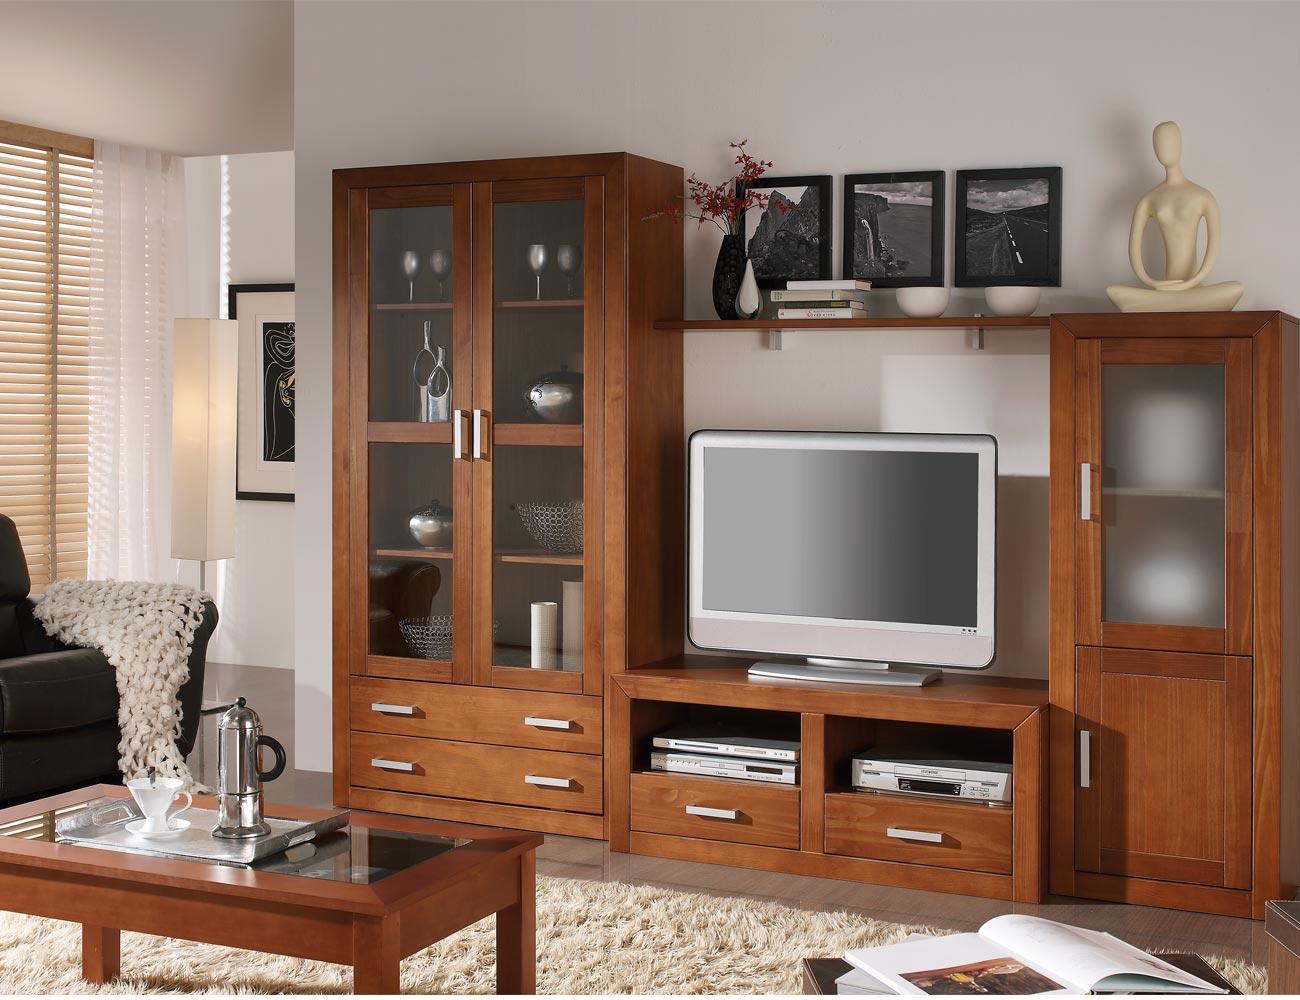 Salones modernos baratos muebles boom muebles de salon for Salones de madera modernos